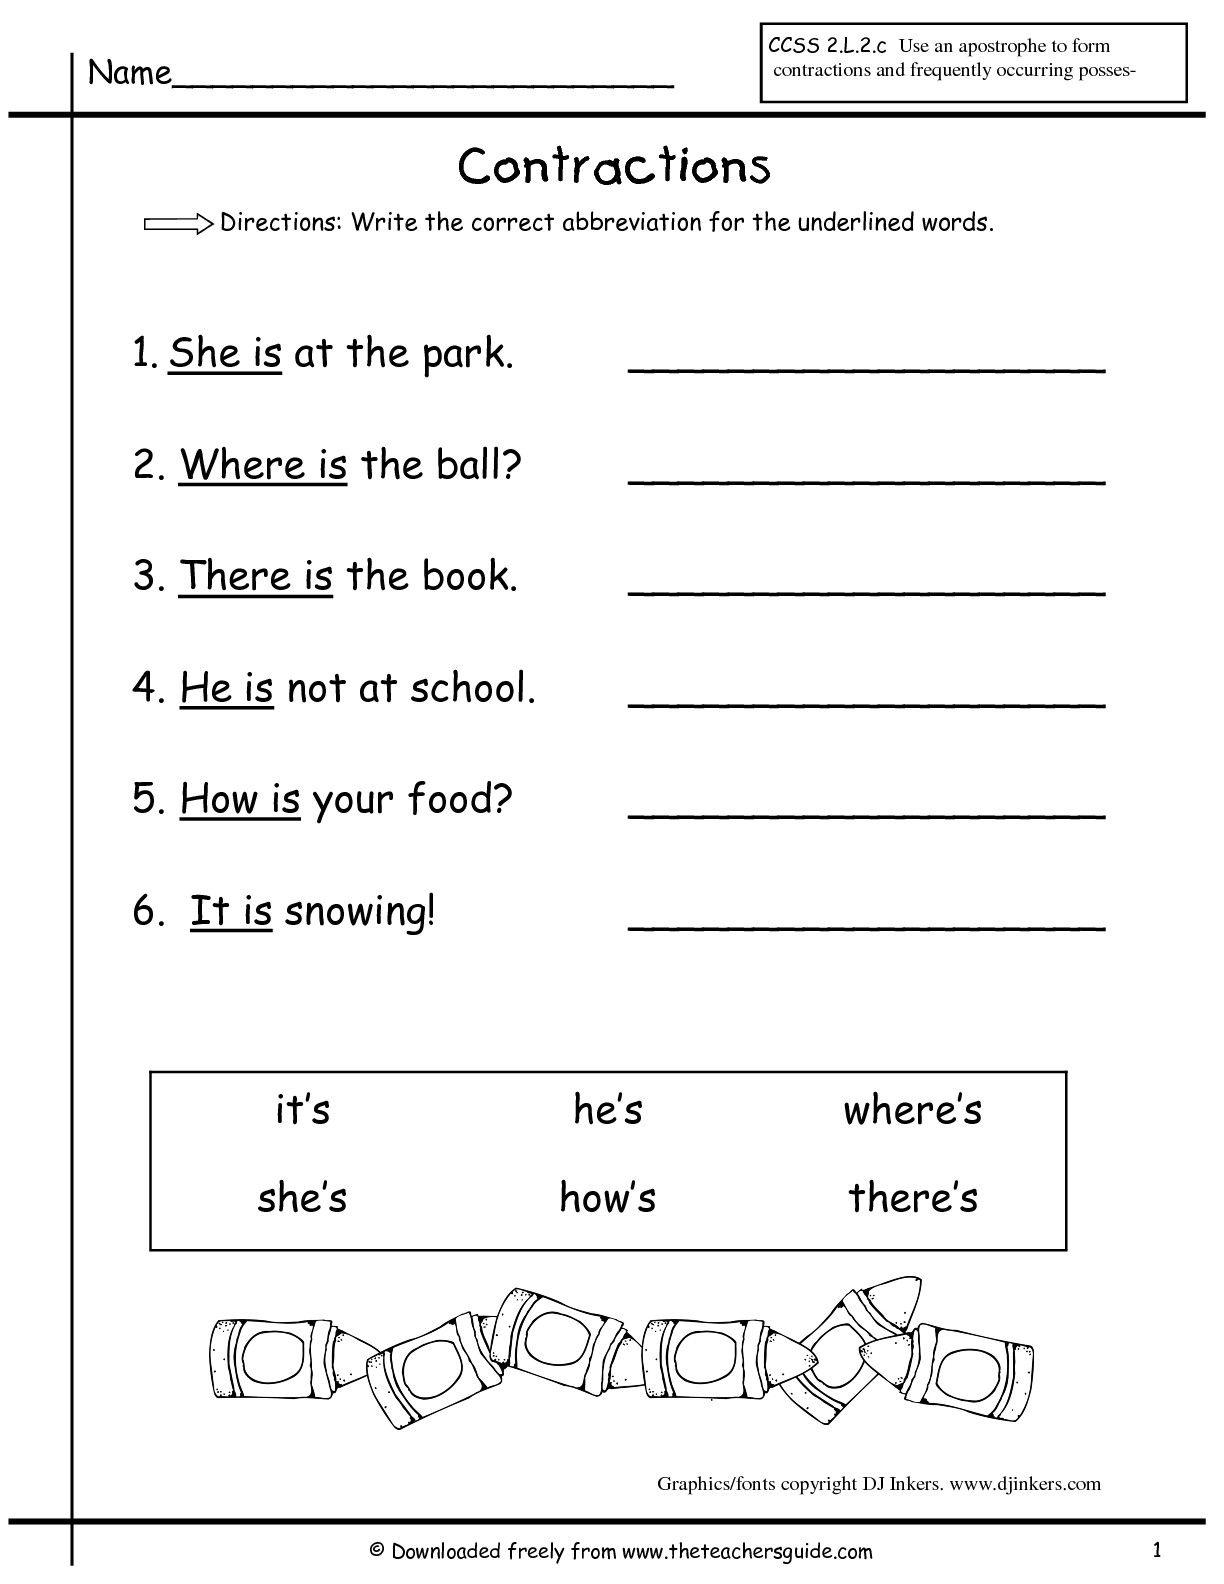 11 Best Contraction Worksheets Images On Best Worksheets